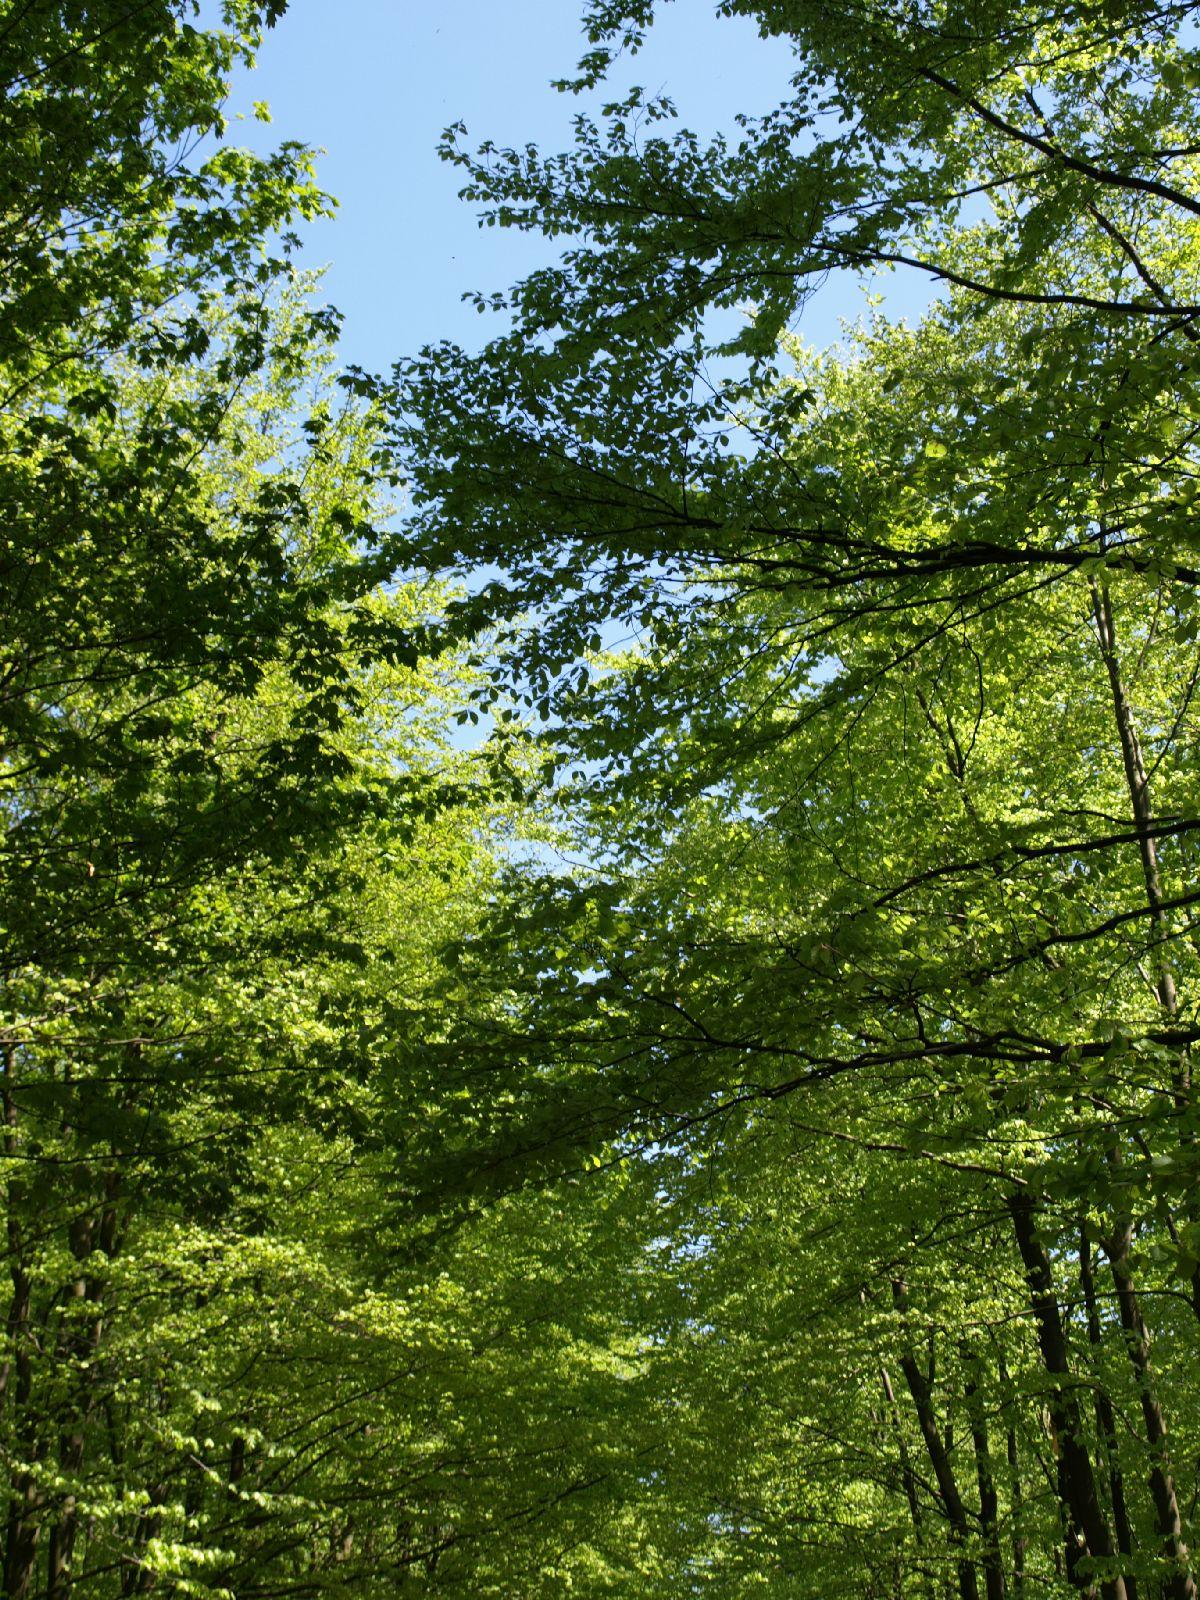 Plants-Trees_Photo_Texture_B_P5042456